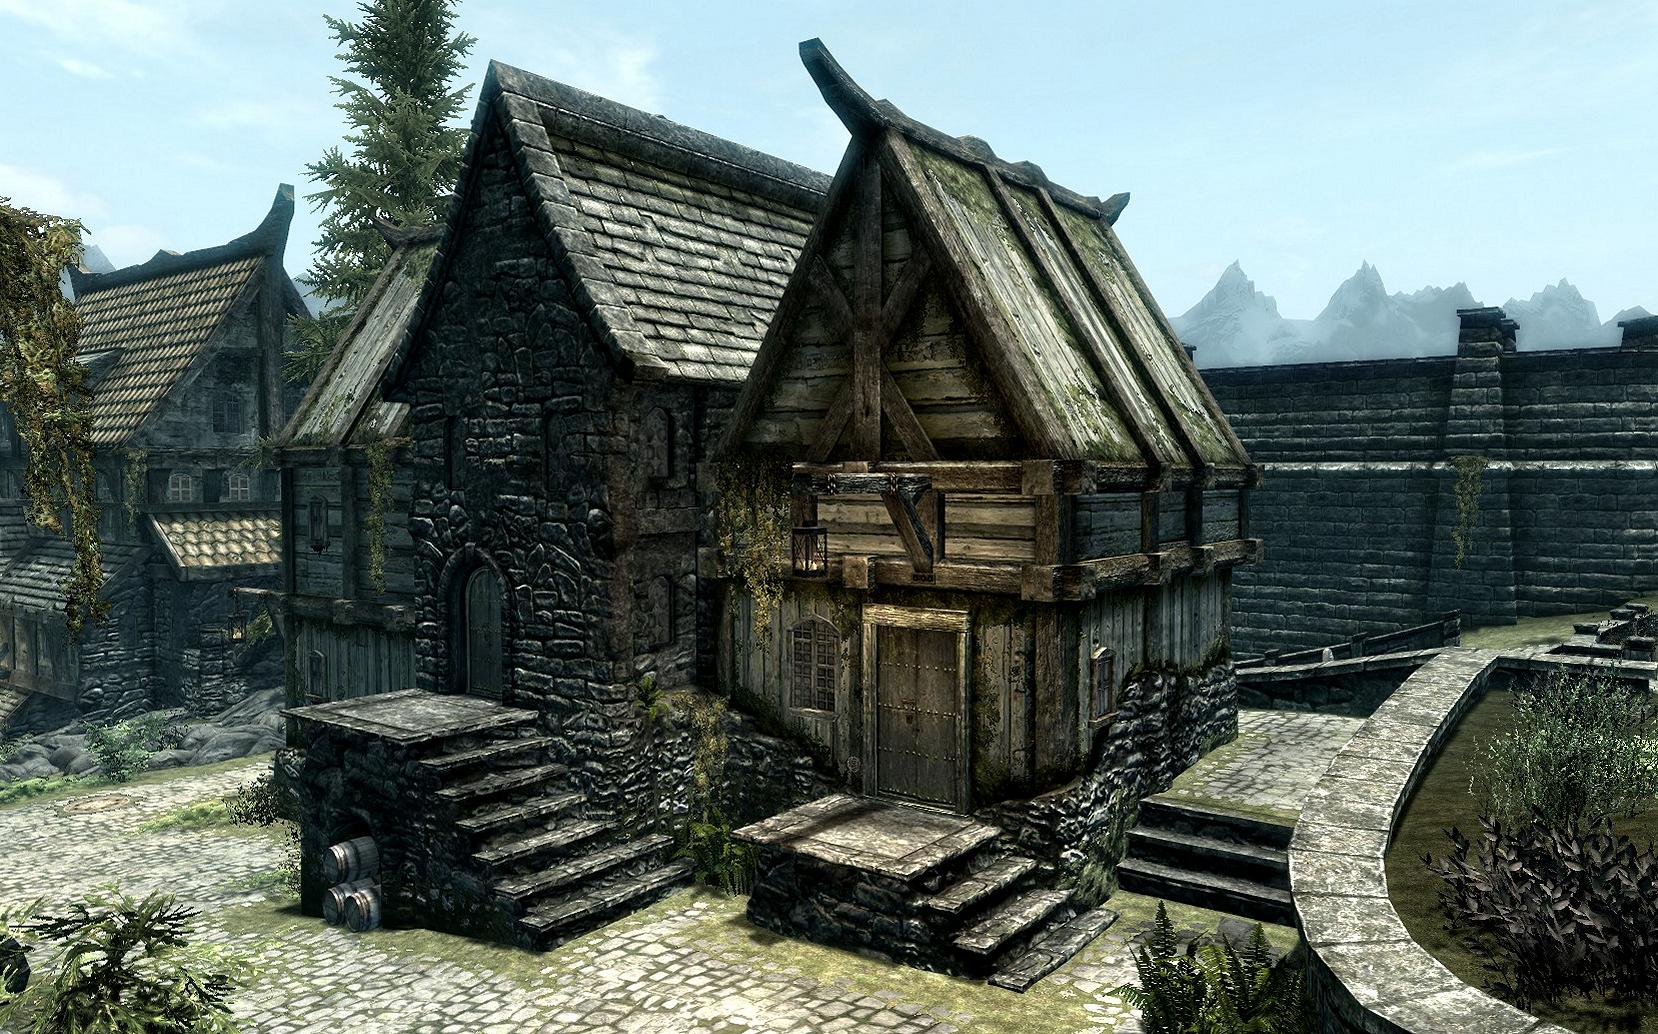 Addvaru0027s House